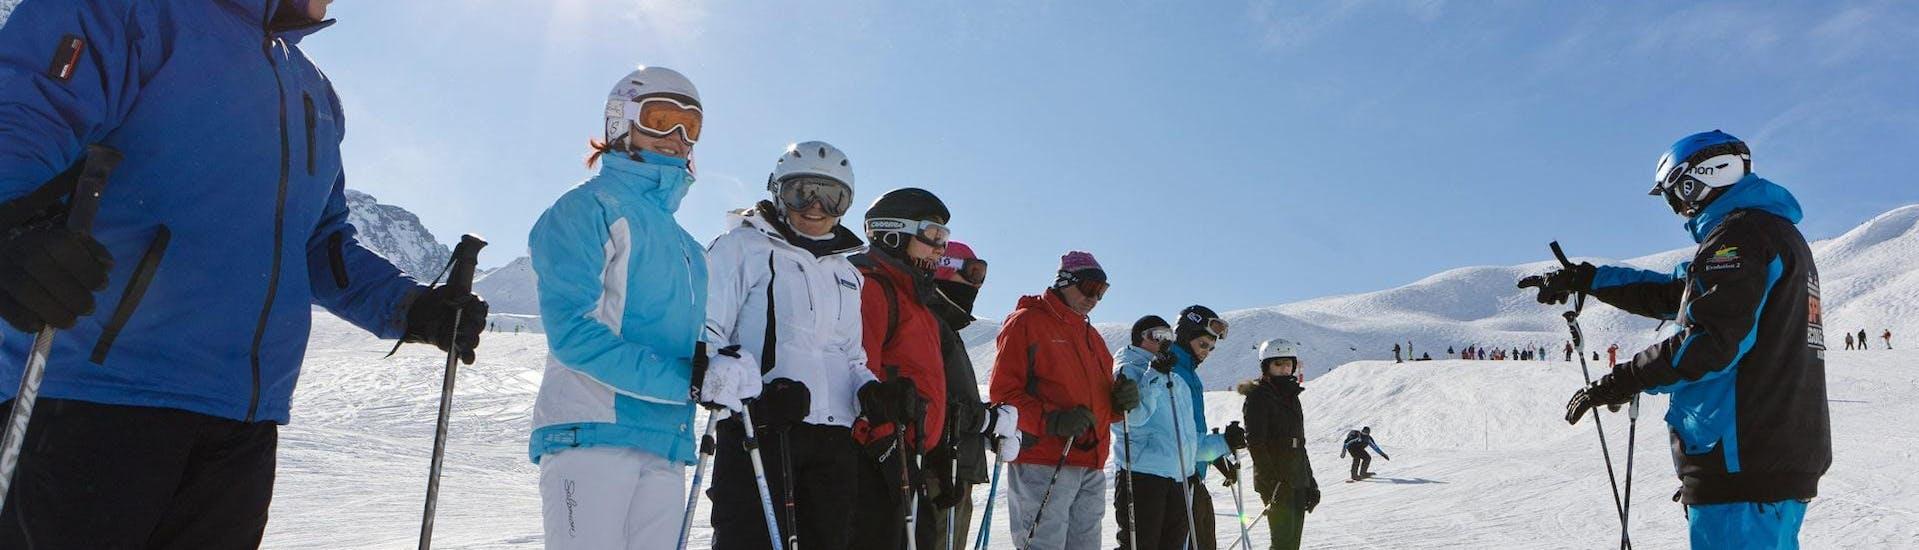 Teen Ski Lessons (13-17 y.) - High Season - Arc 1950